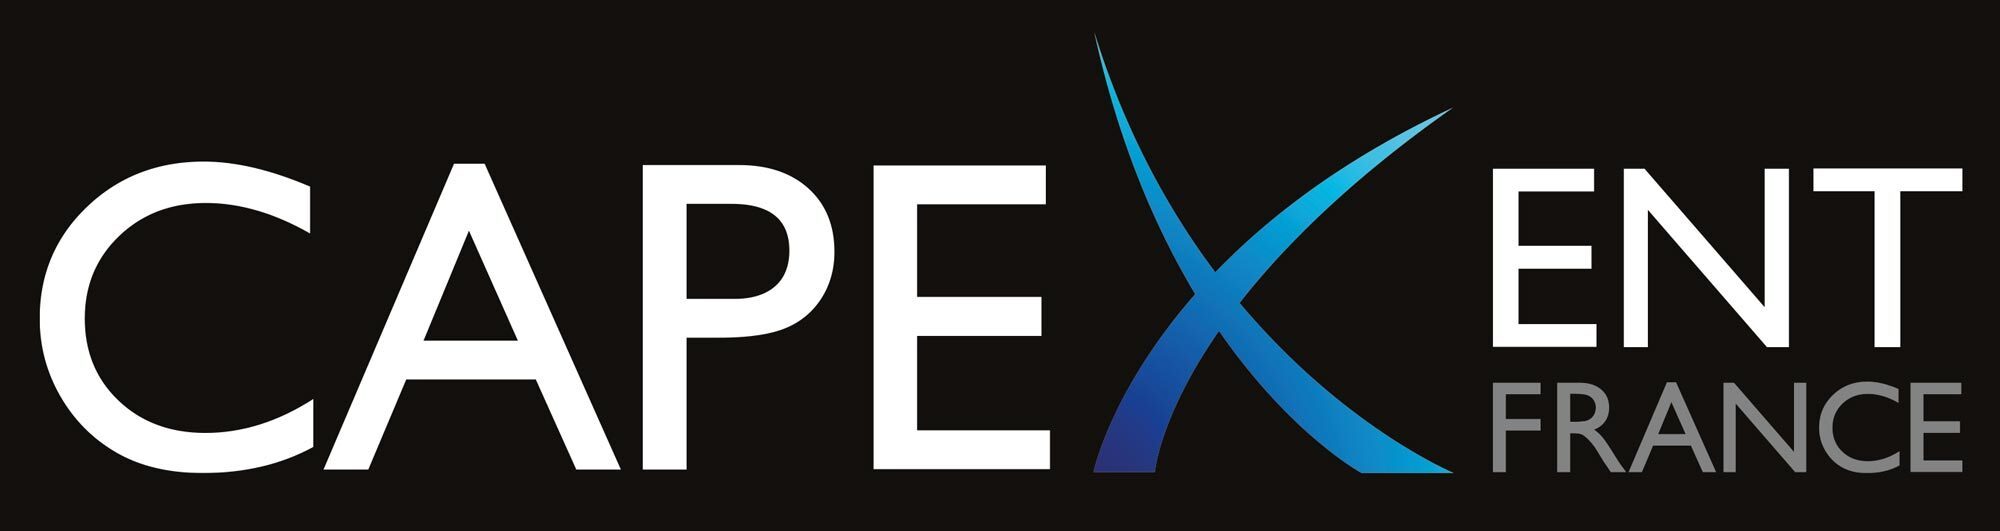 CAPEX'ENT FRANCE